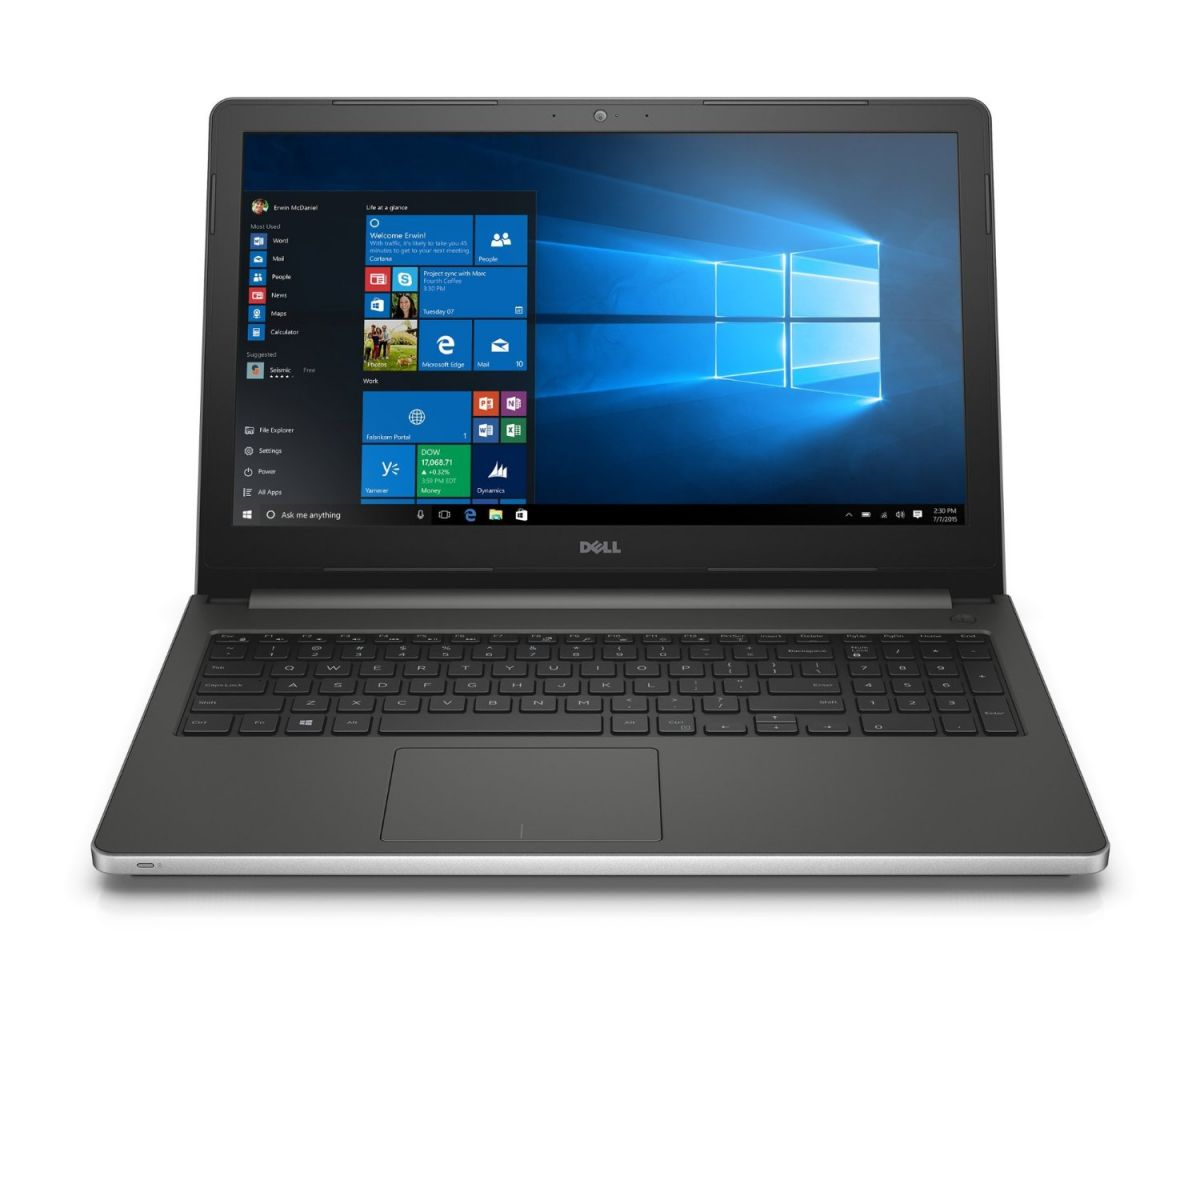 Nb Dell Inspiron 5457 Core I7 6500U 2.5Ghz/1Tb+8Gb/8Gb/14/4Gb Nvidia/Win10Pro